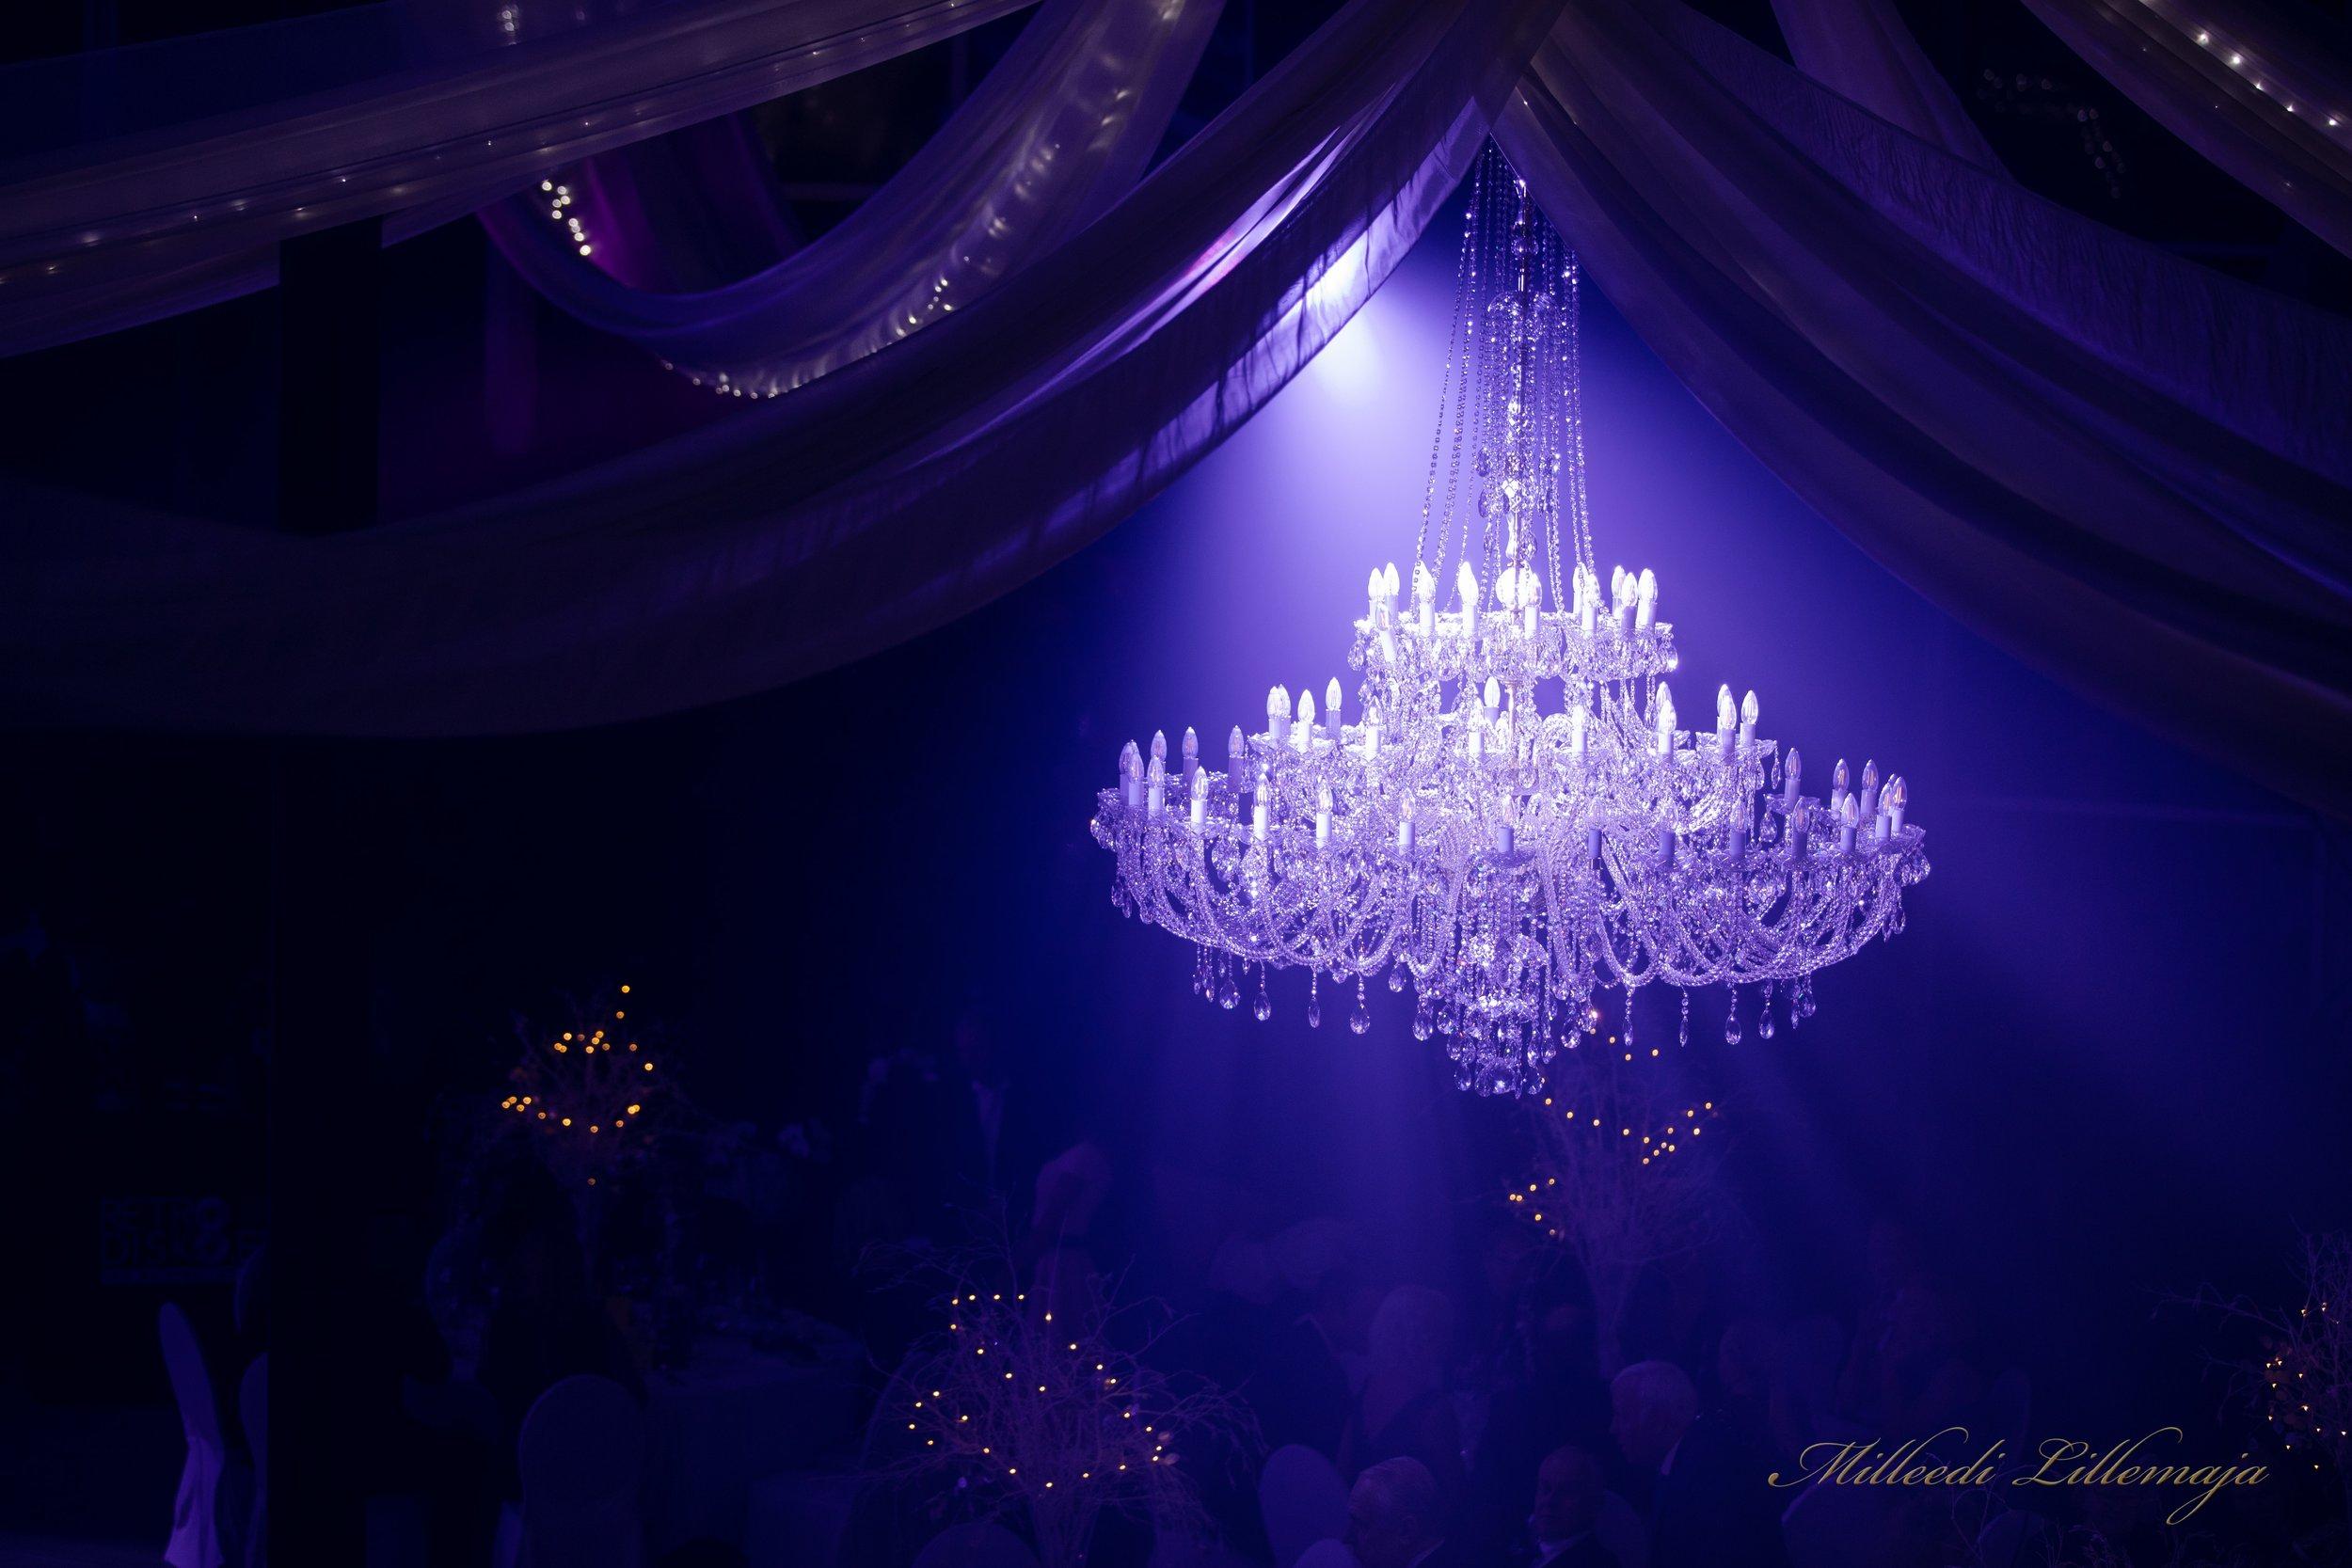 Milledi-Ballroom-Wraovsky-Crystal-Chandelier-Princesse-1.JPG